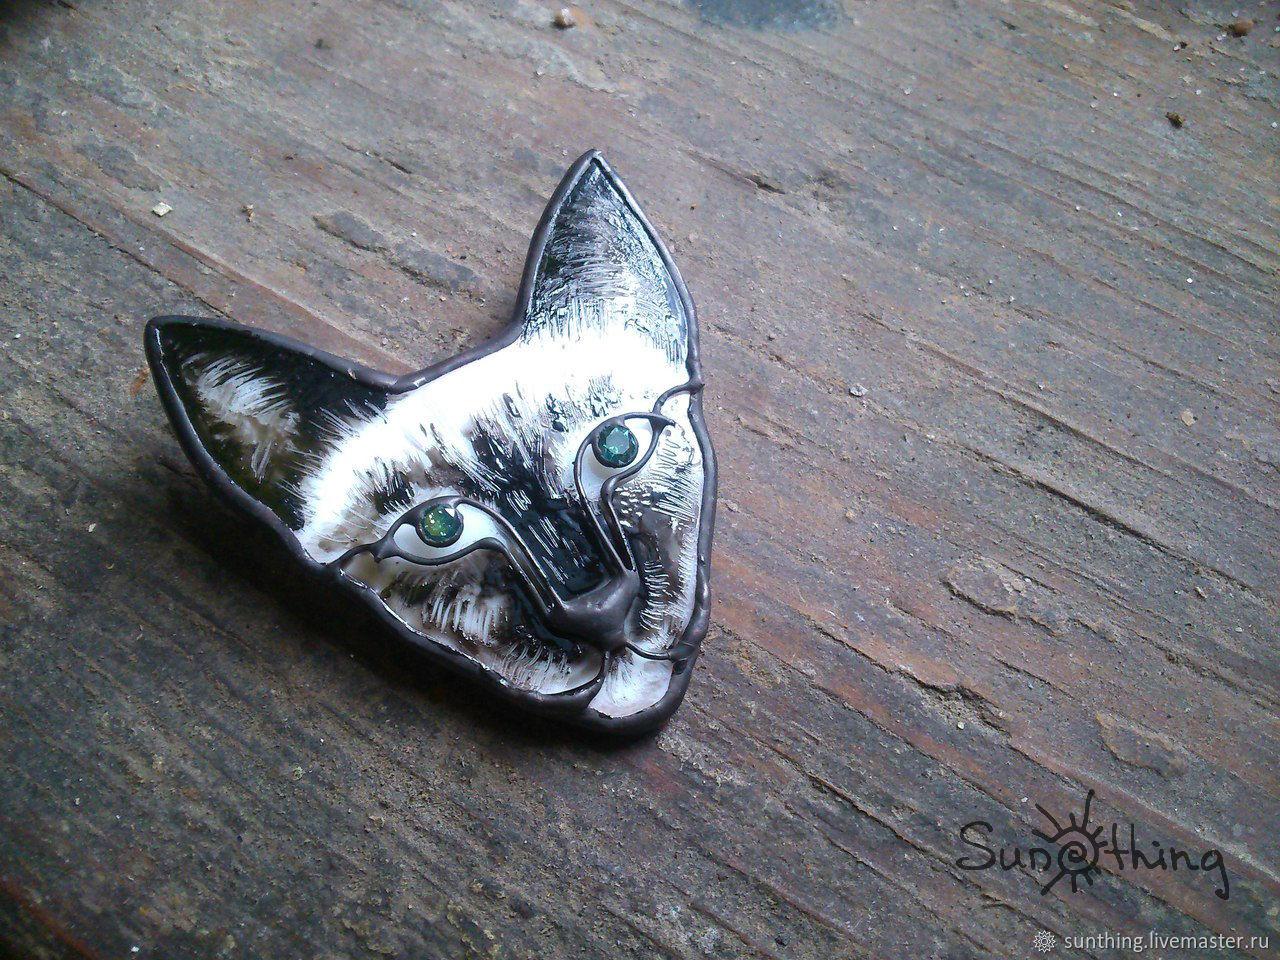 CAT brooch, Brooches, St. Petersburg,  Фото №1